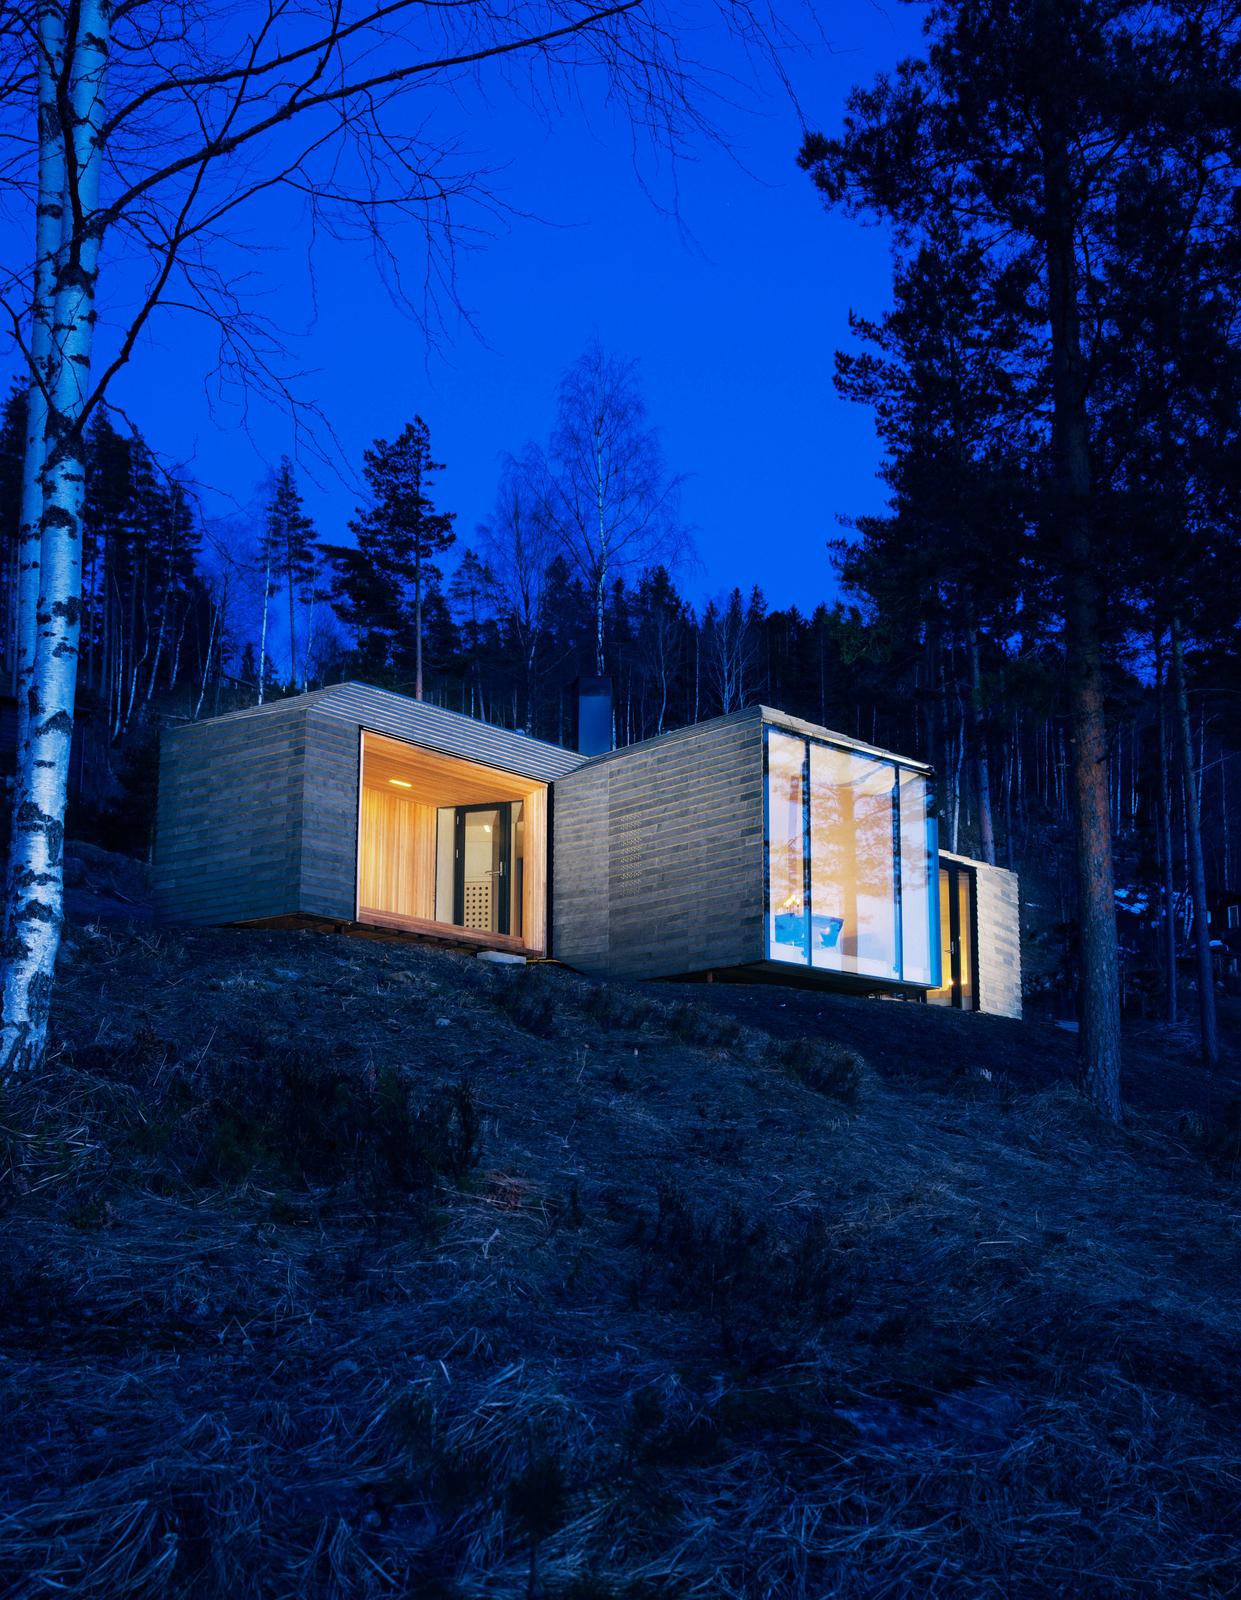 Scandinavian Small House Design: Scandinavian Cabins' Comfort And Minimalism